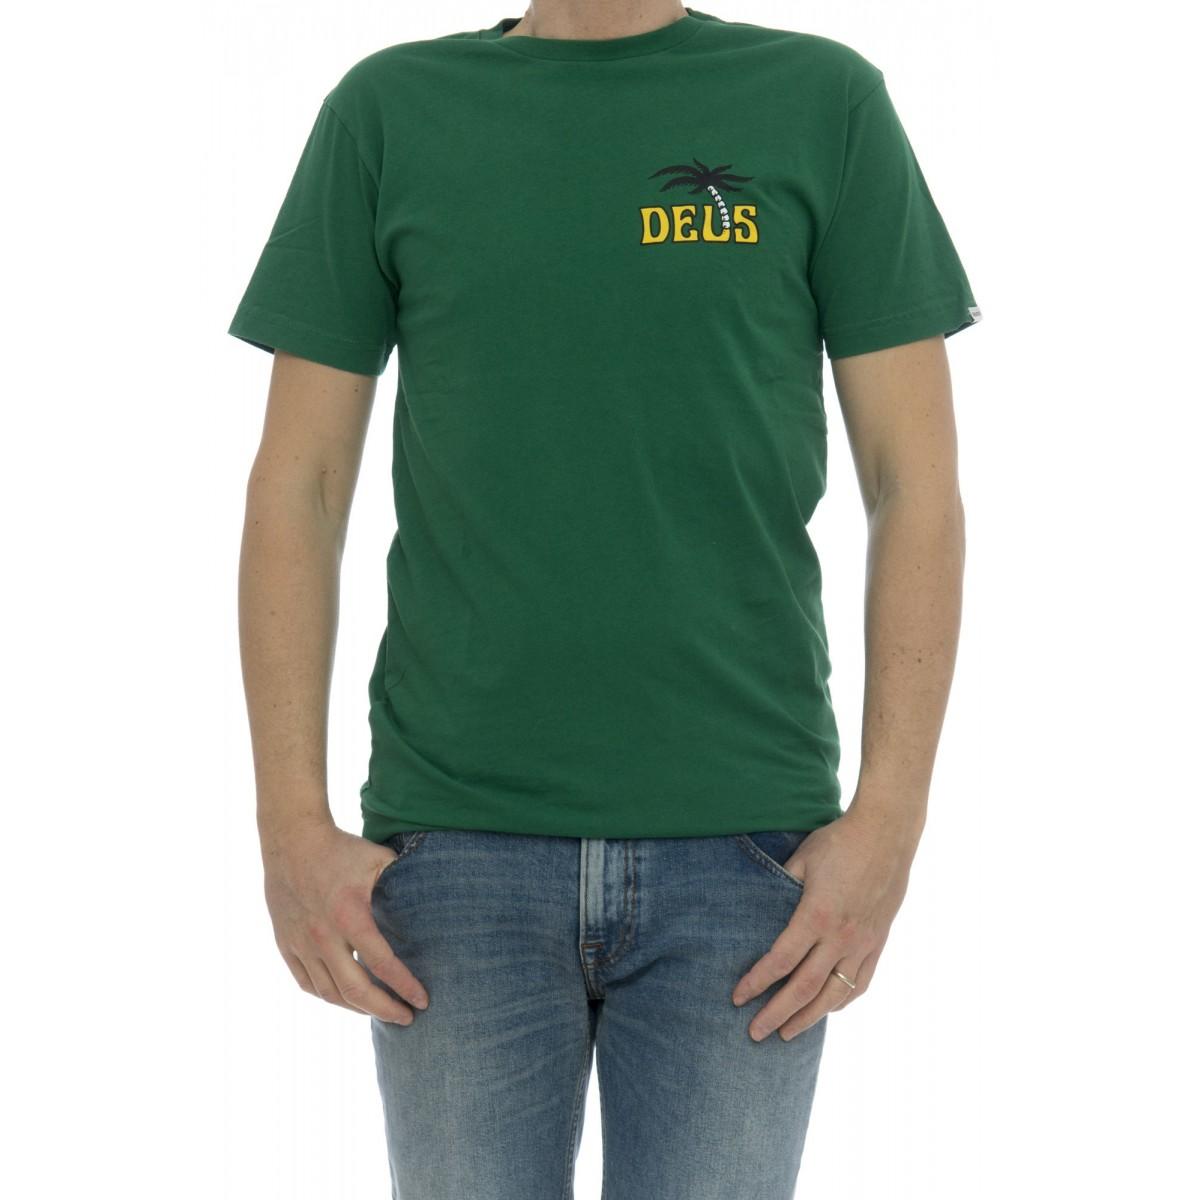 T-shirt - Dmp71468